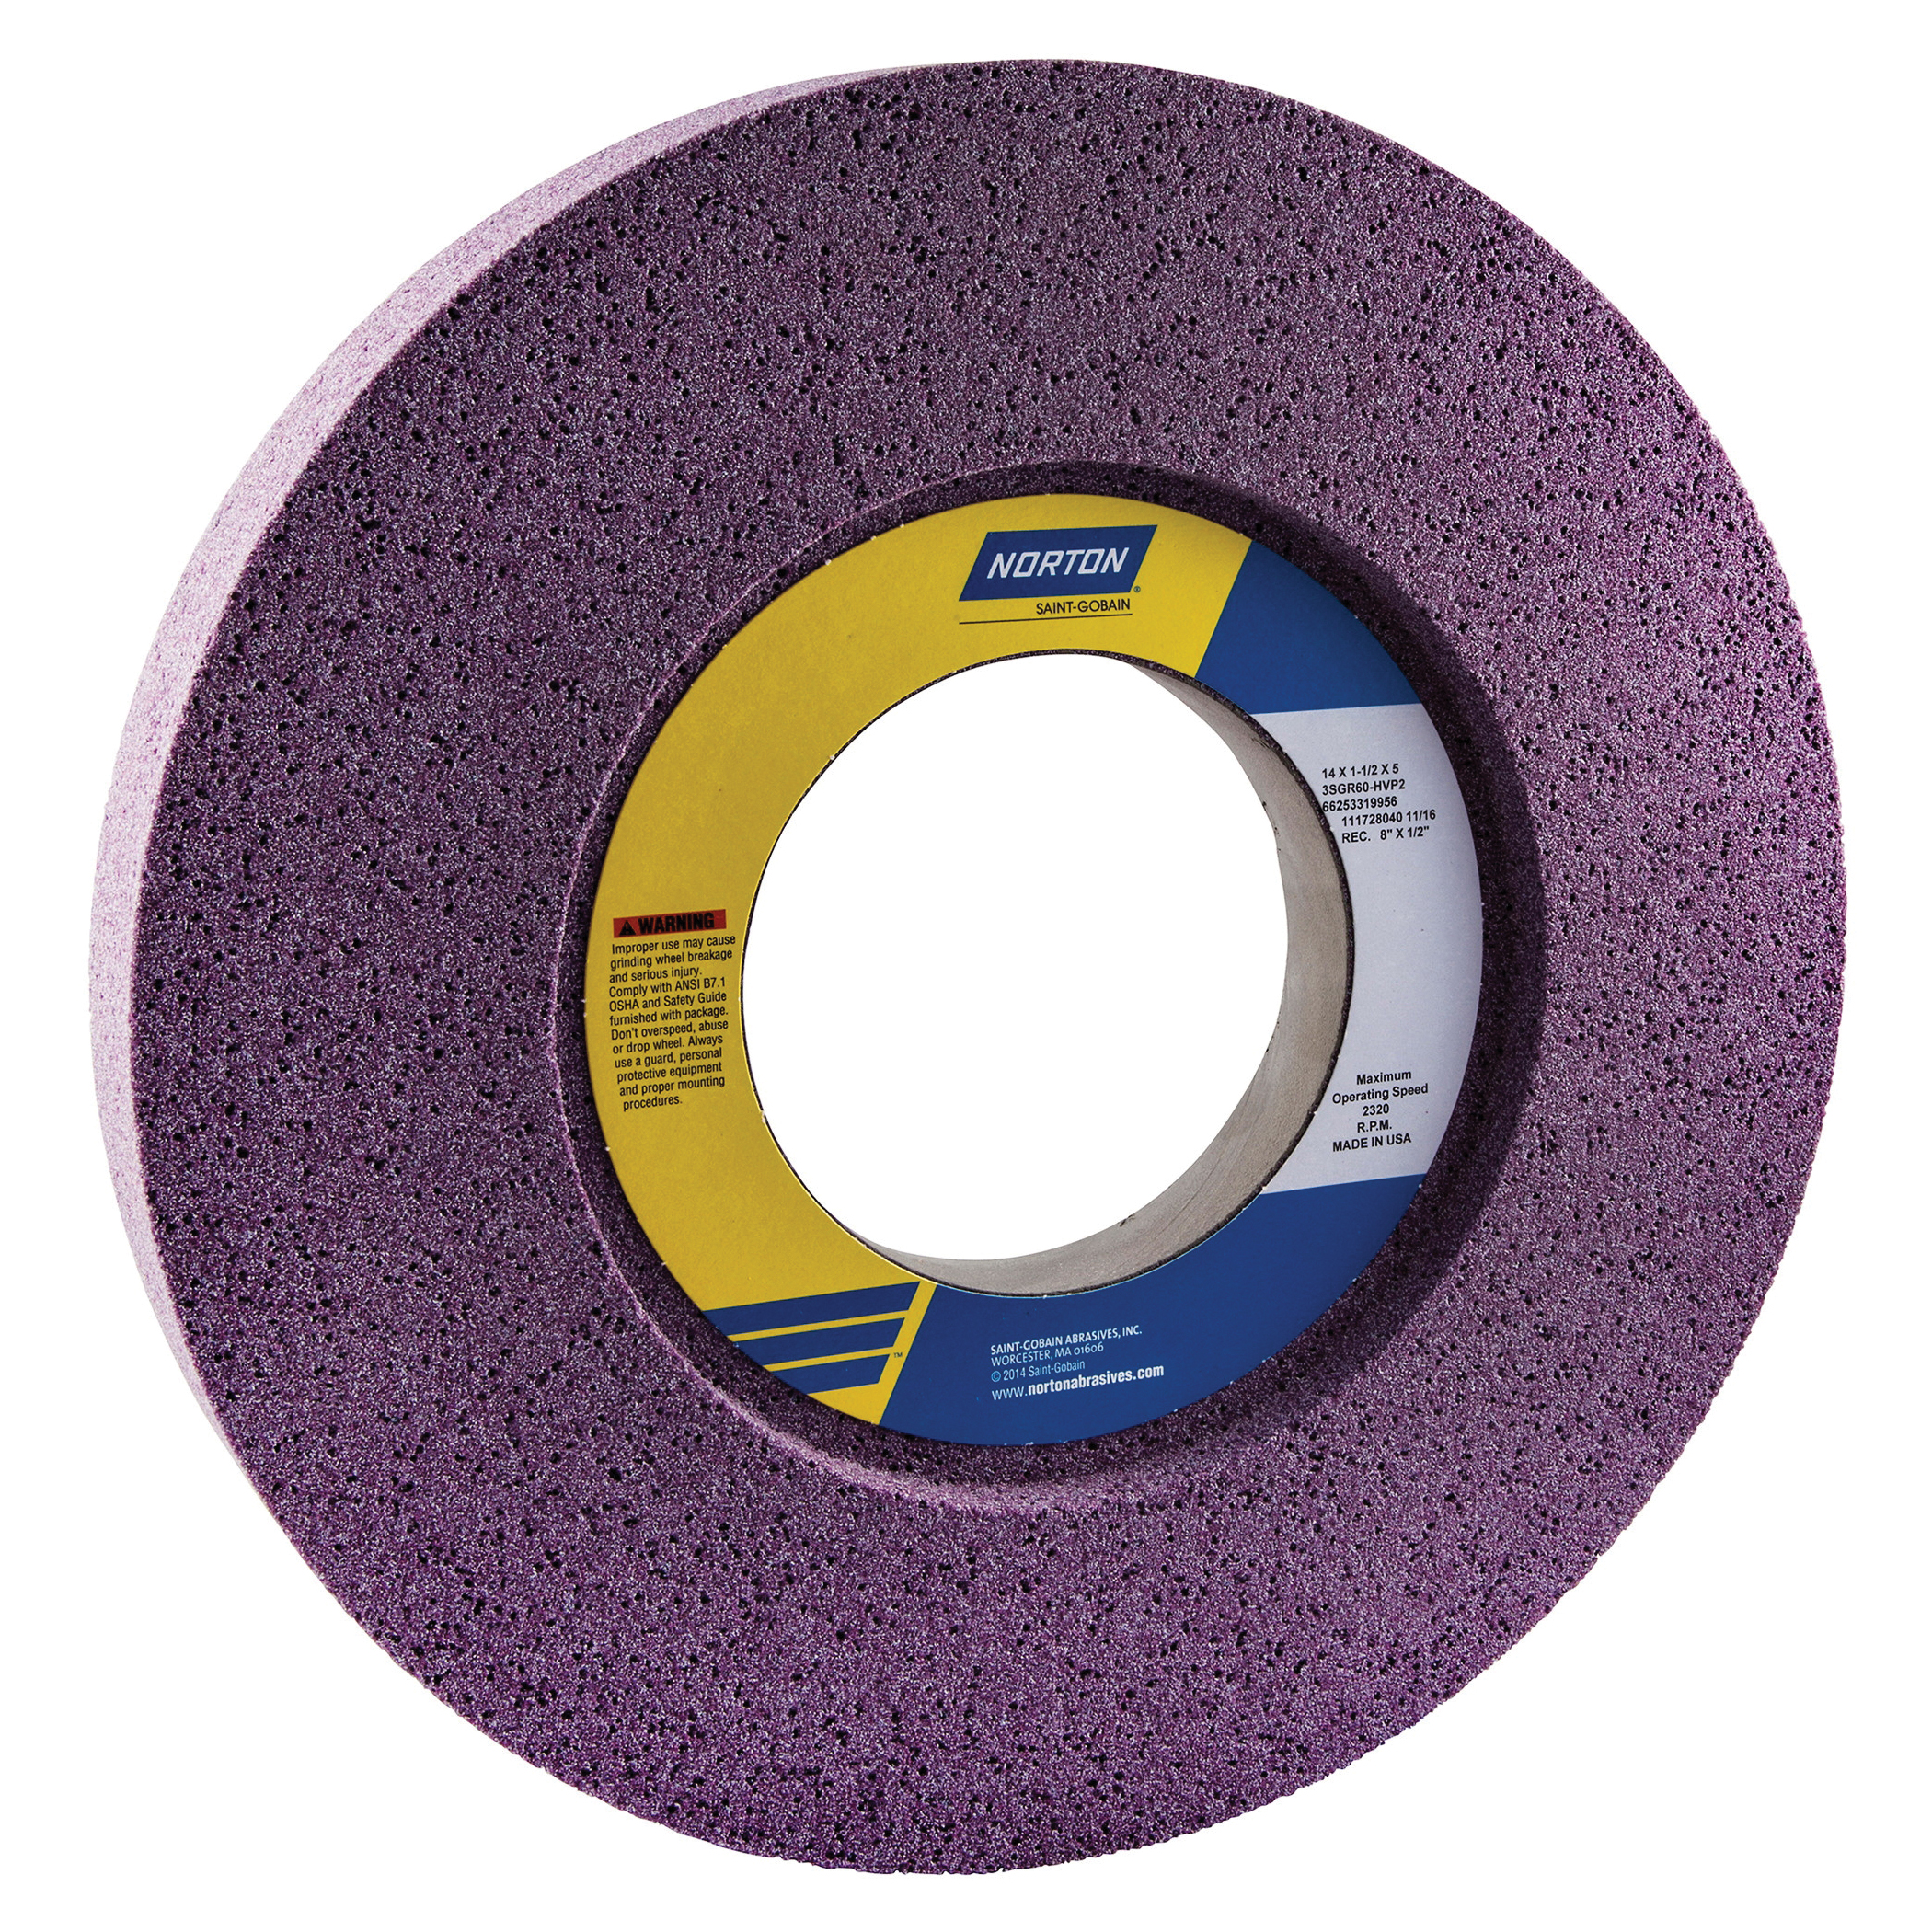 Norton® 66253319956 3SGR 1-Side Recessed Toolroom Wheel, 14 in Dia x 1-1/2 in THK, 5 in Center Hole, 60 Grit, Ceramic Alumina Abrasive